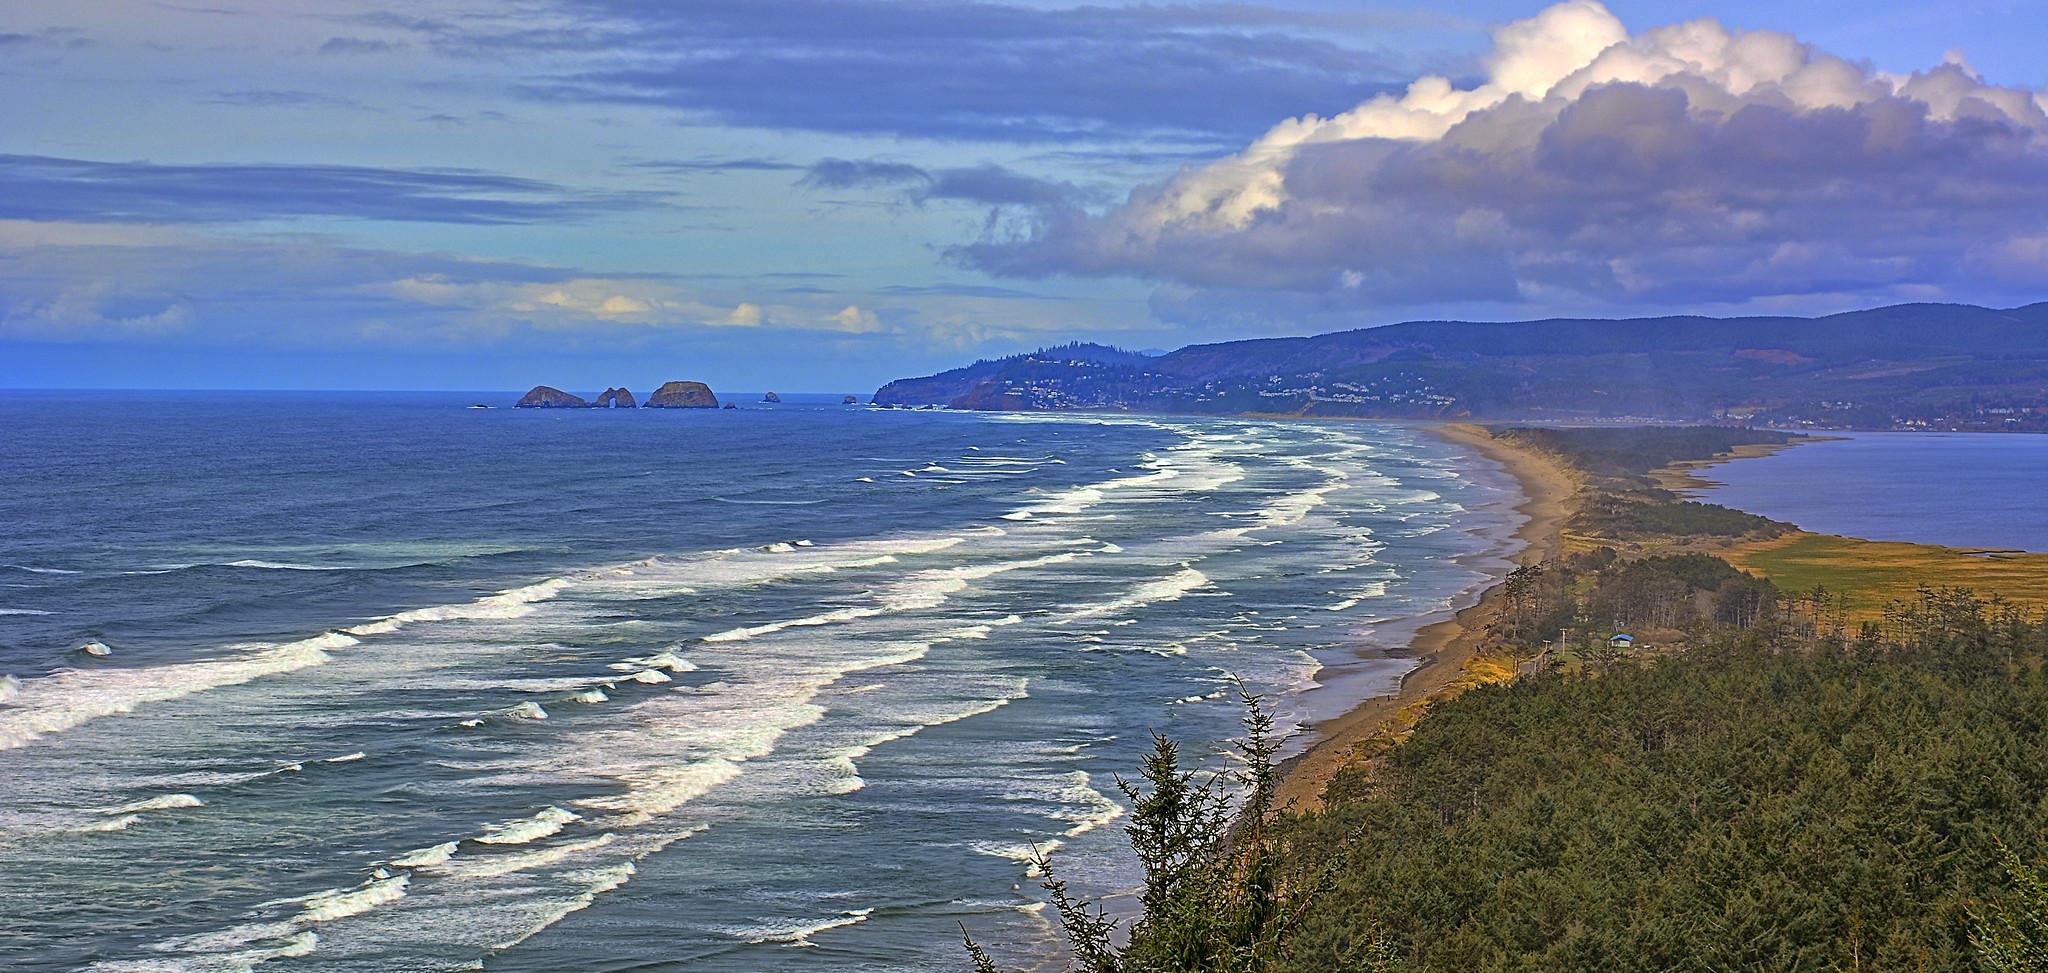 Great hikes on the Oregon Coast